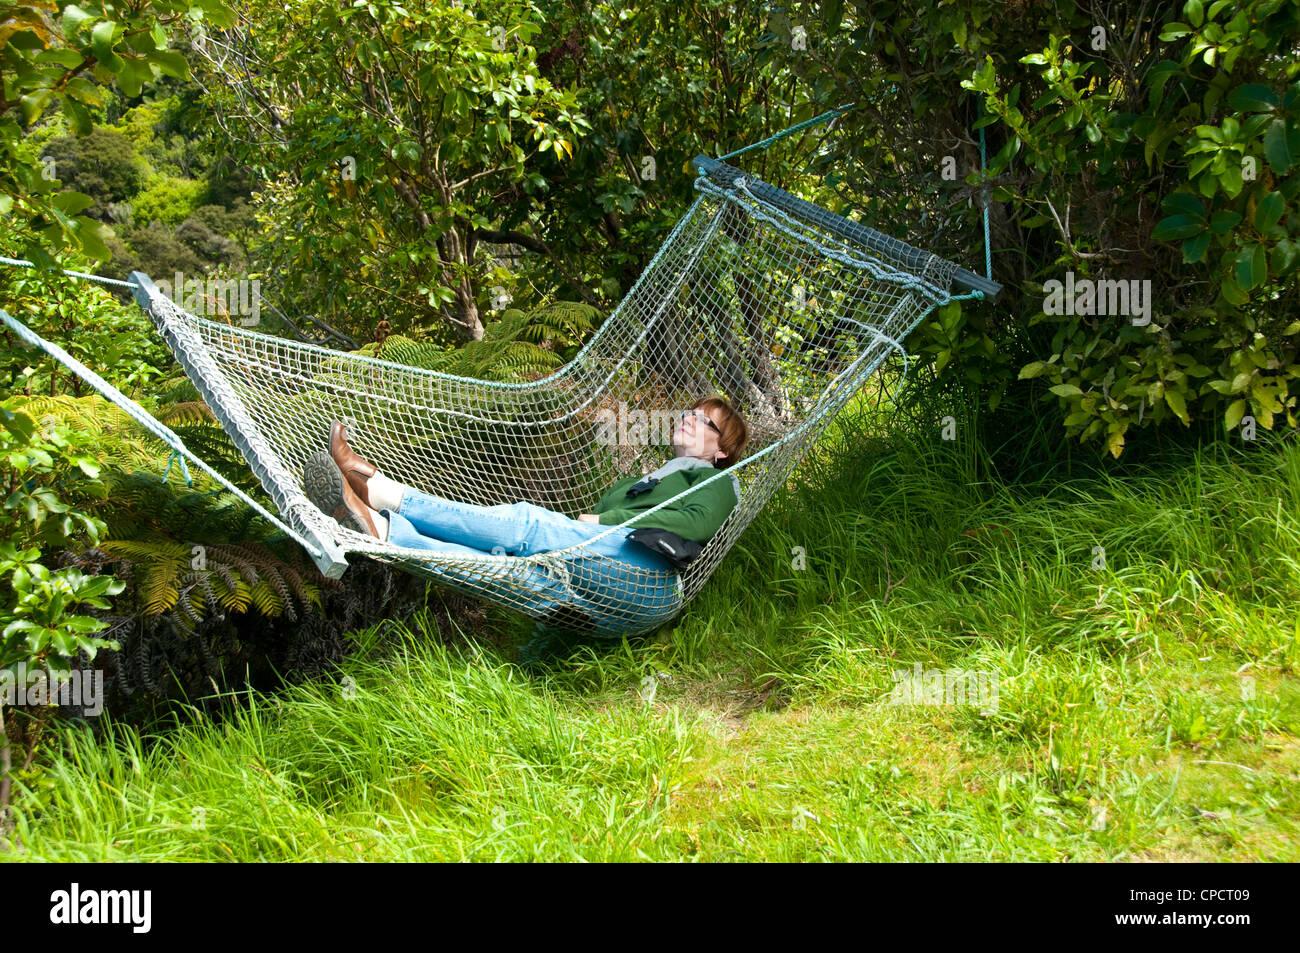 New Zealand South Island, woman in hammock at Picton lodge resort Lochmara - Stock Image